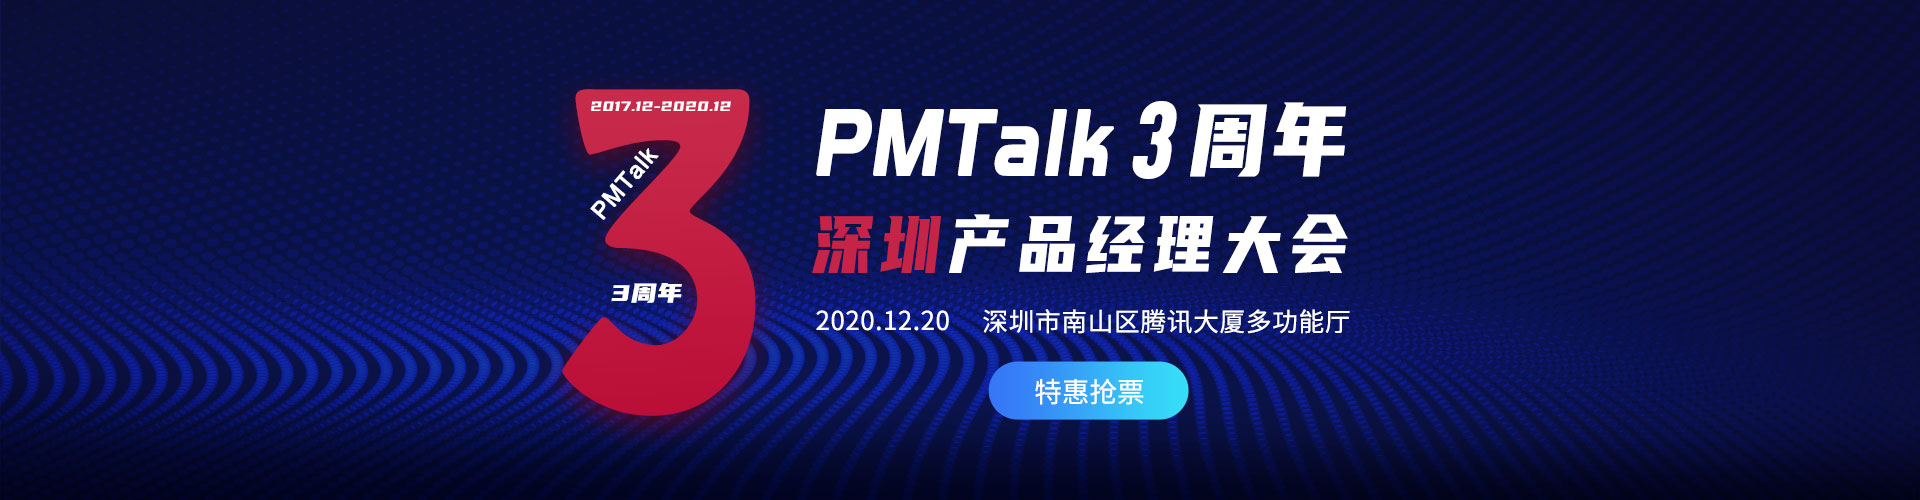 PMTalk3周年全国产品经理大会-深圳站